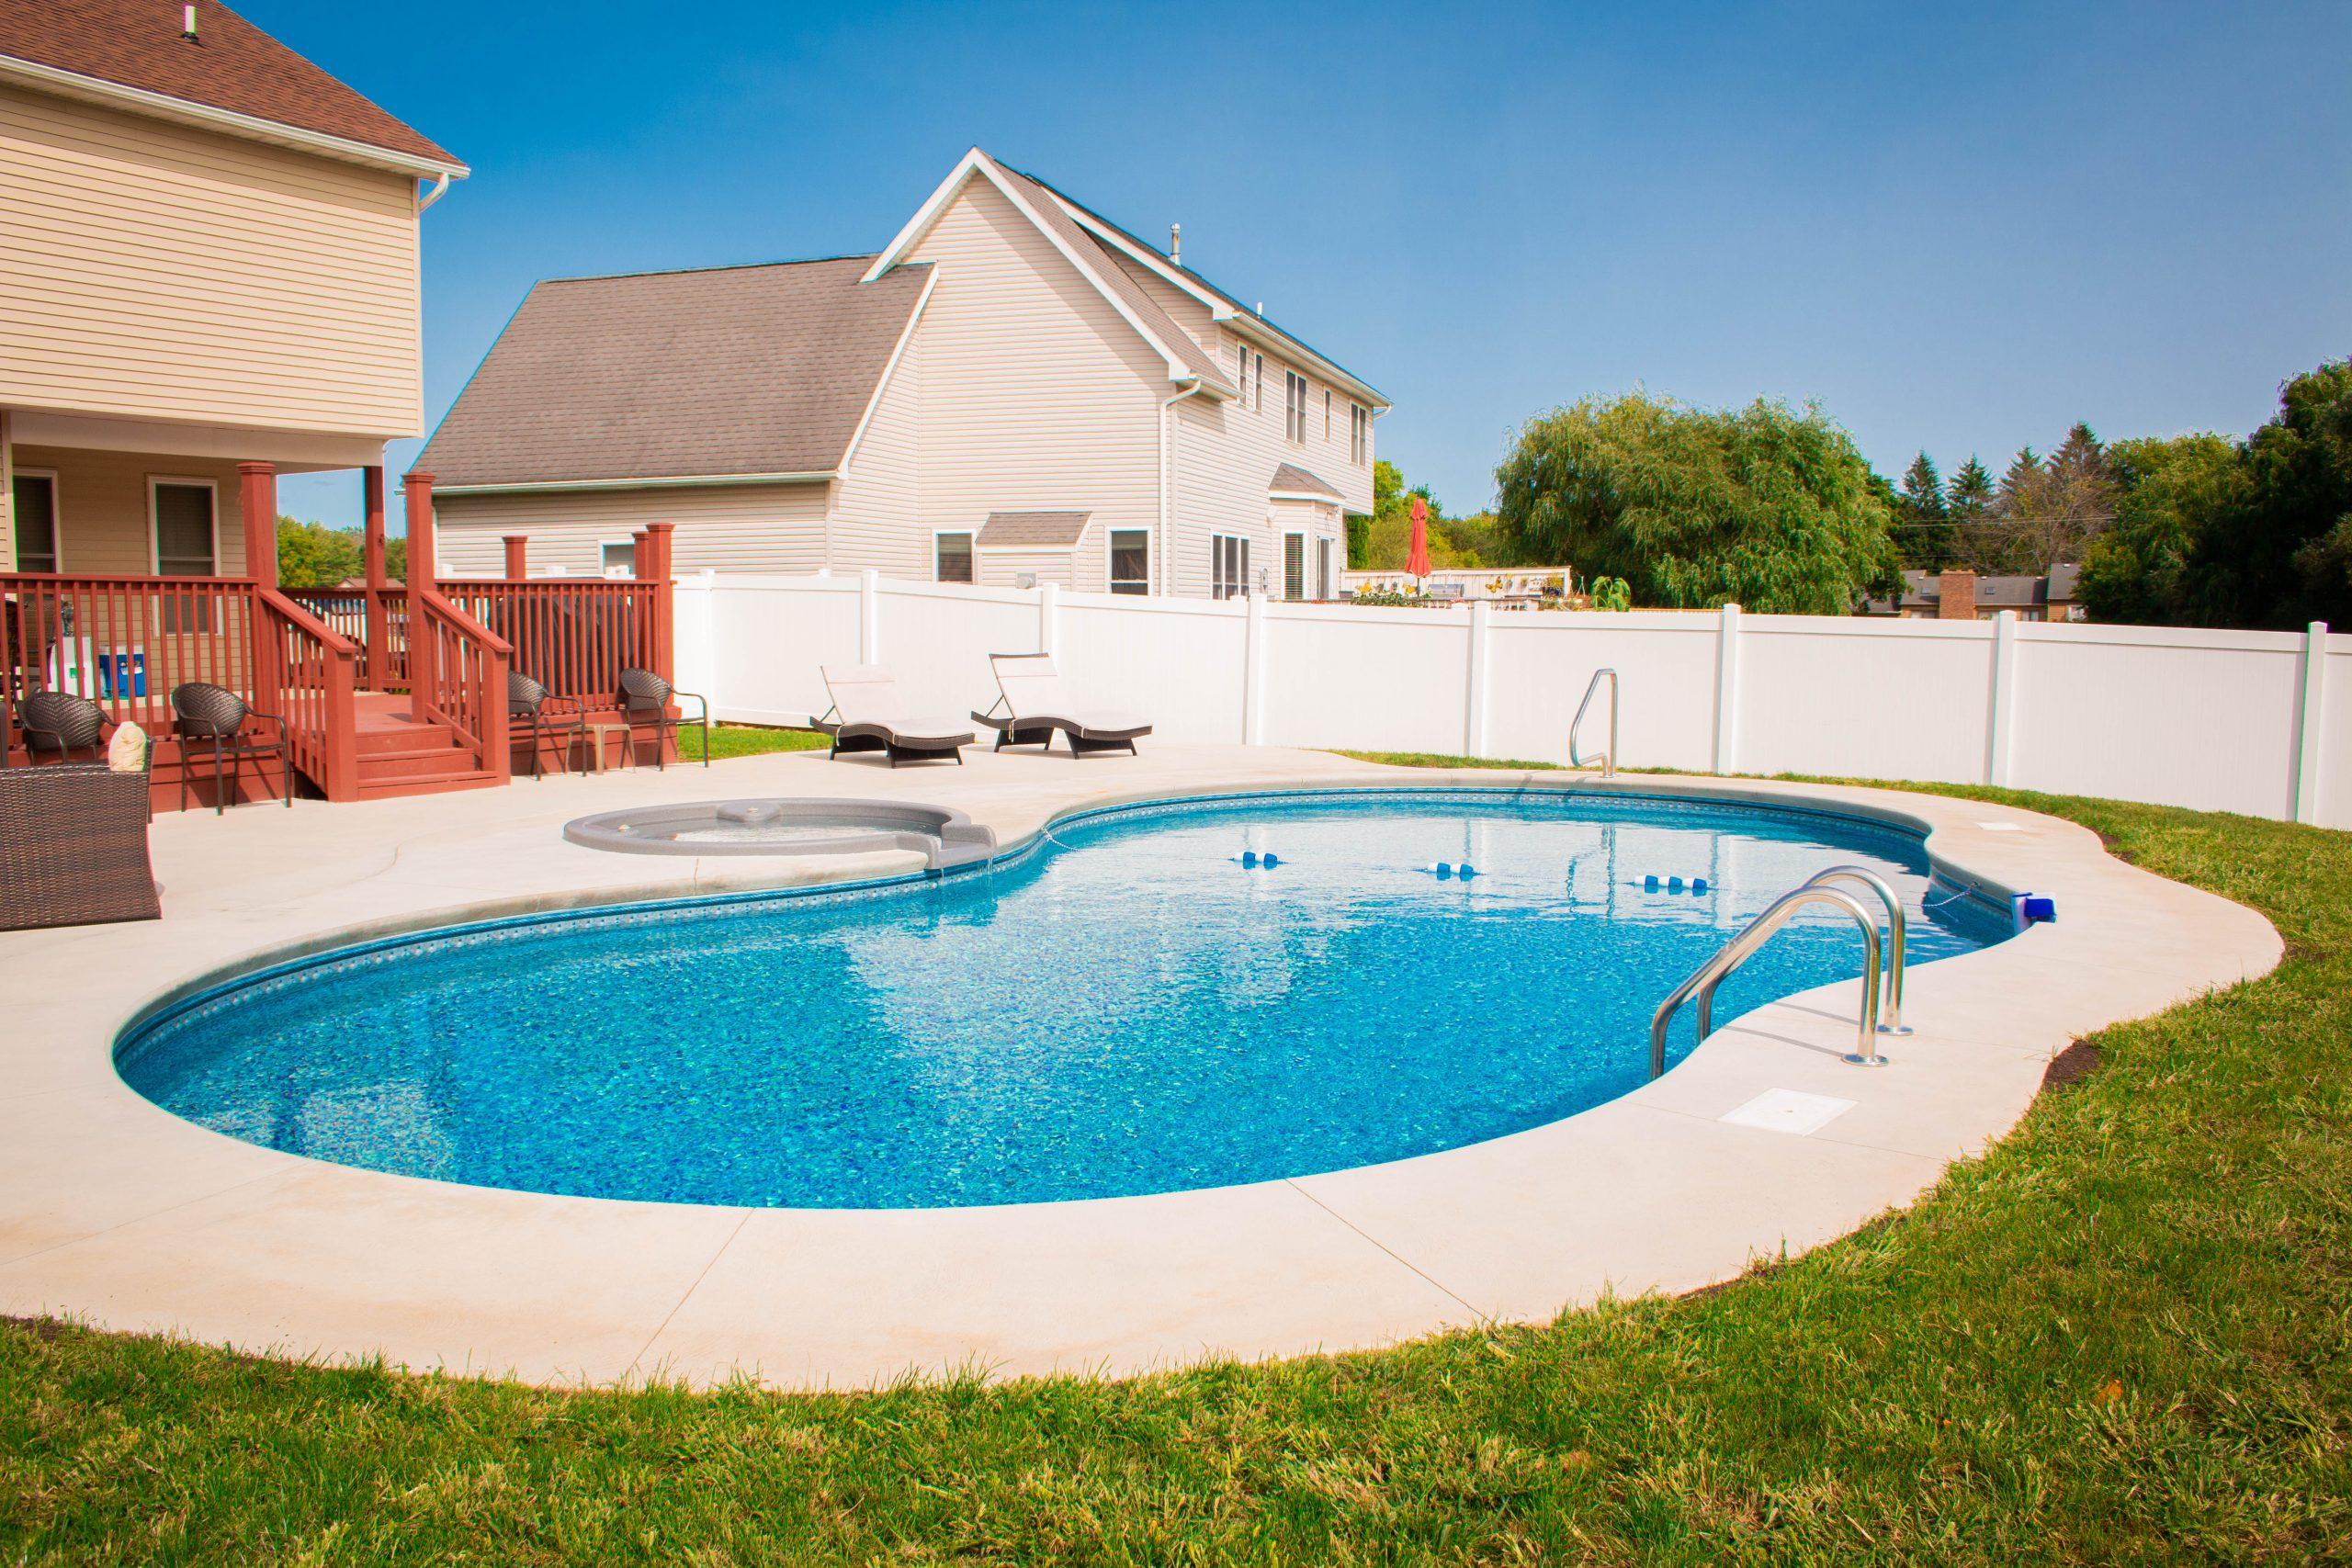 North Eastern Pools inground pool in a backyard